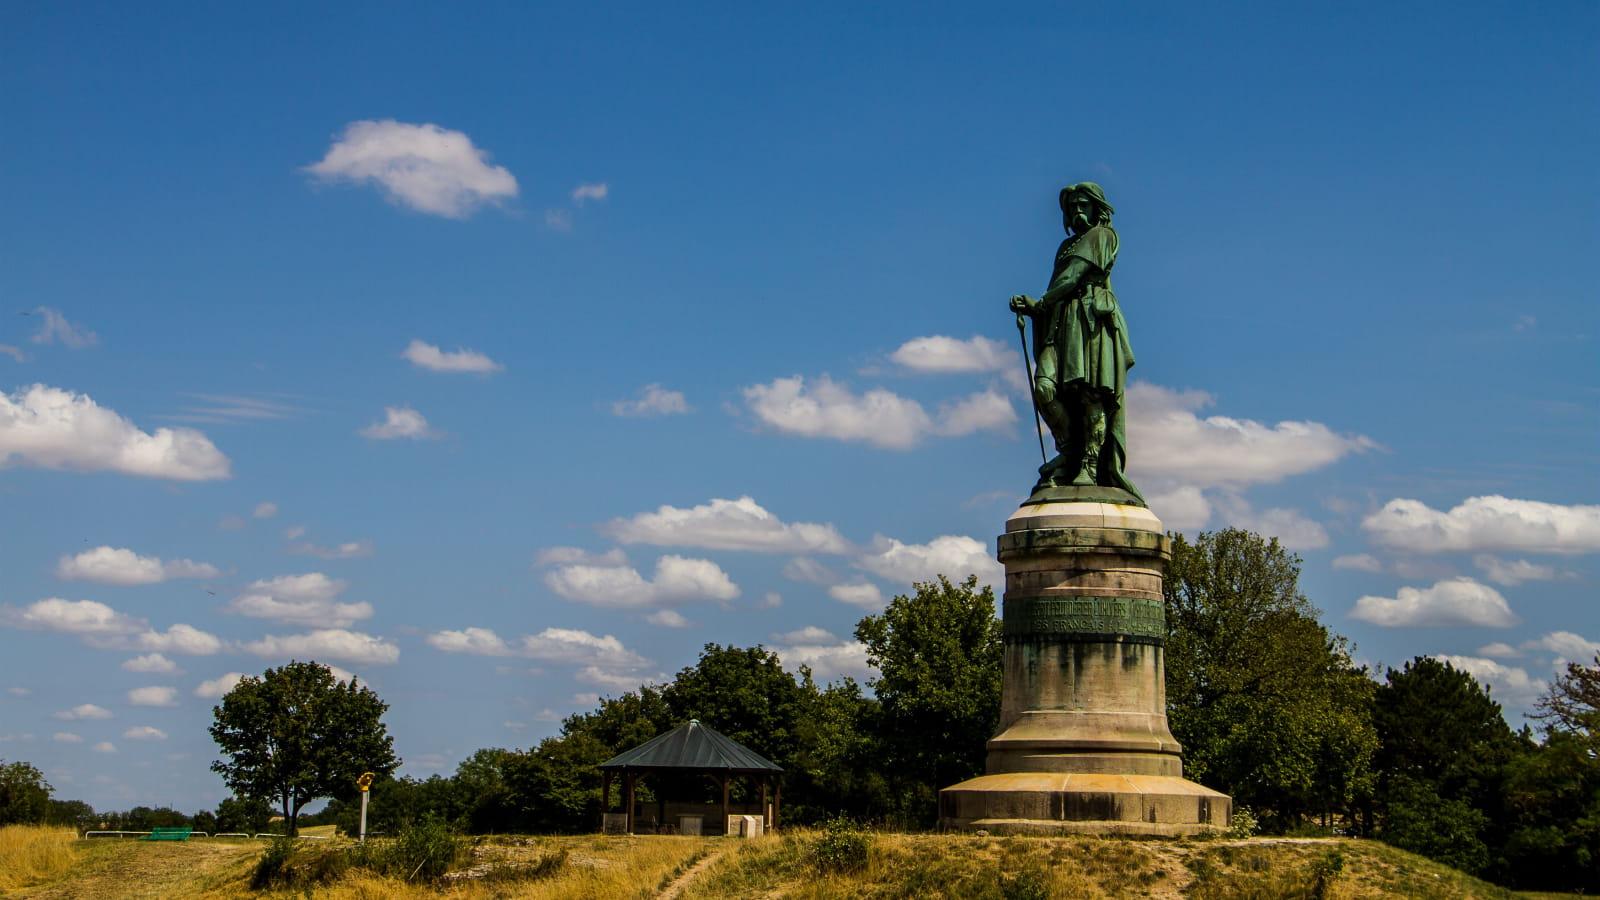 Statue de Vercingétorix à Alésia